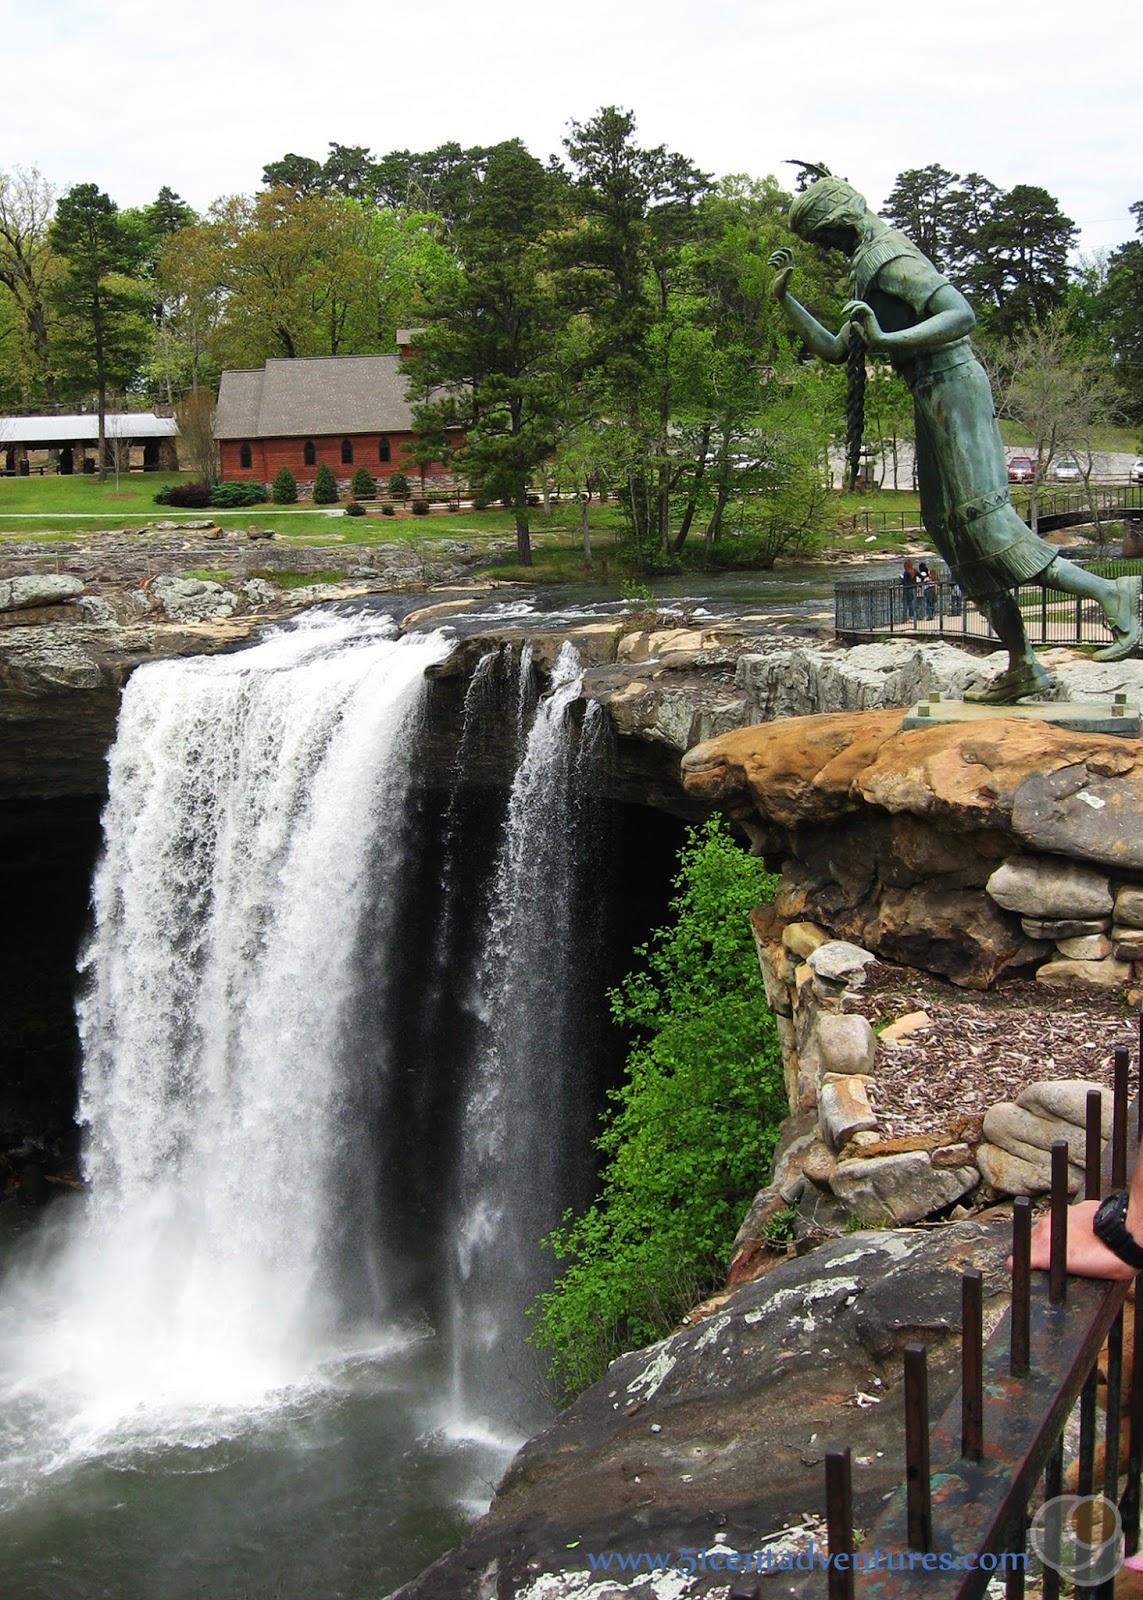 51 Cent Adventures: Noccalula Falls Park - Gadsden, Alabama